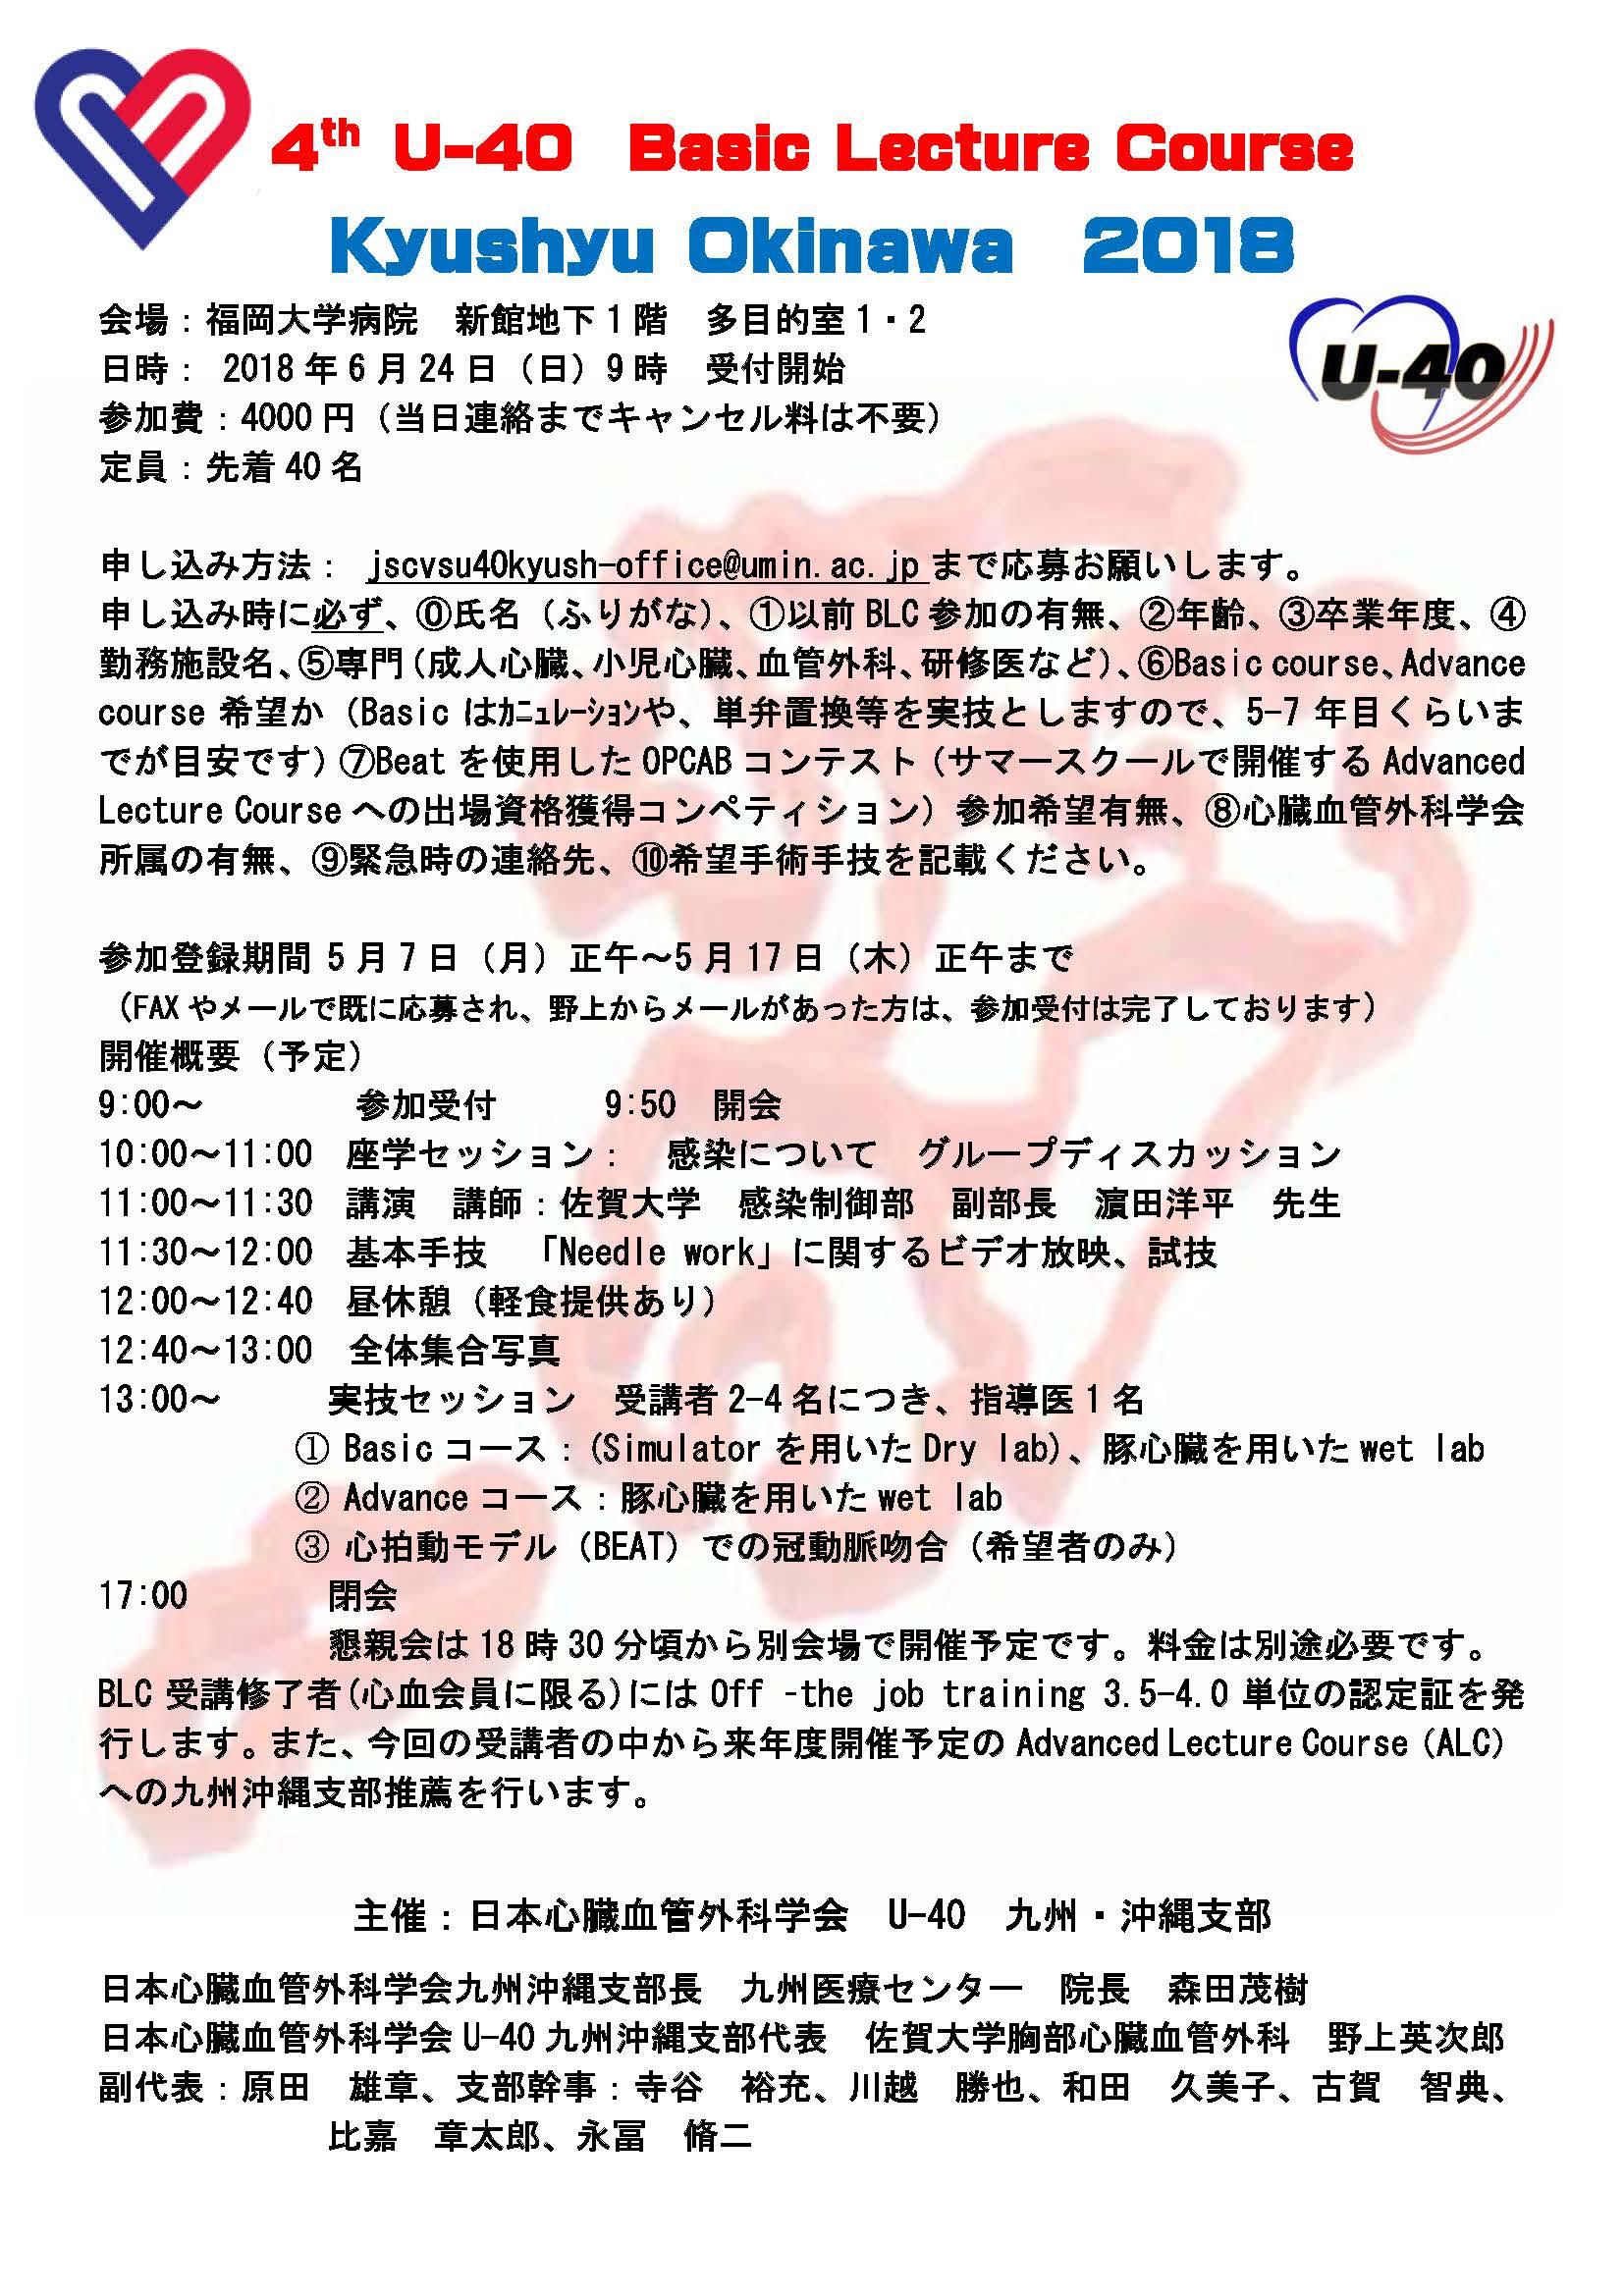 6月24日 第4回 U-40 九州沖縄支部 Basic Lecture Course